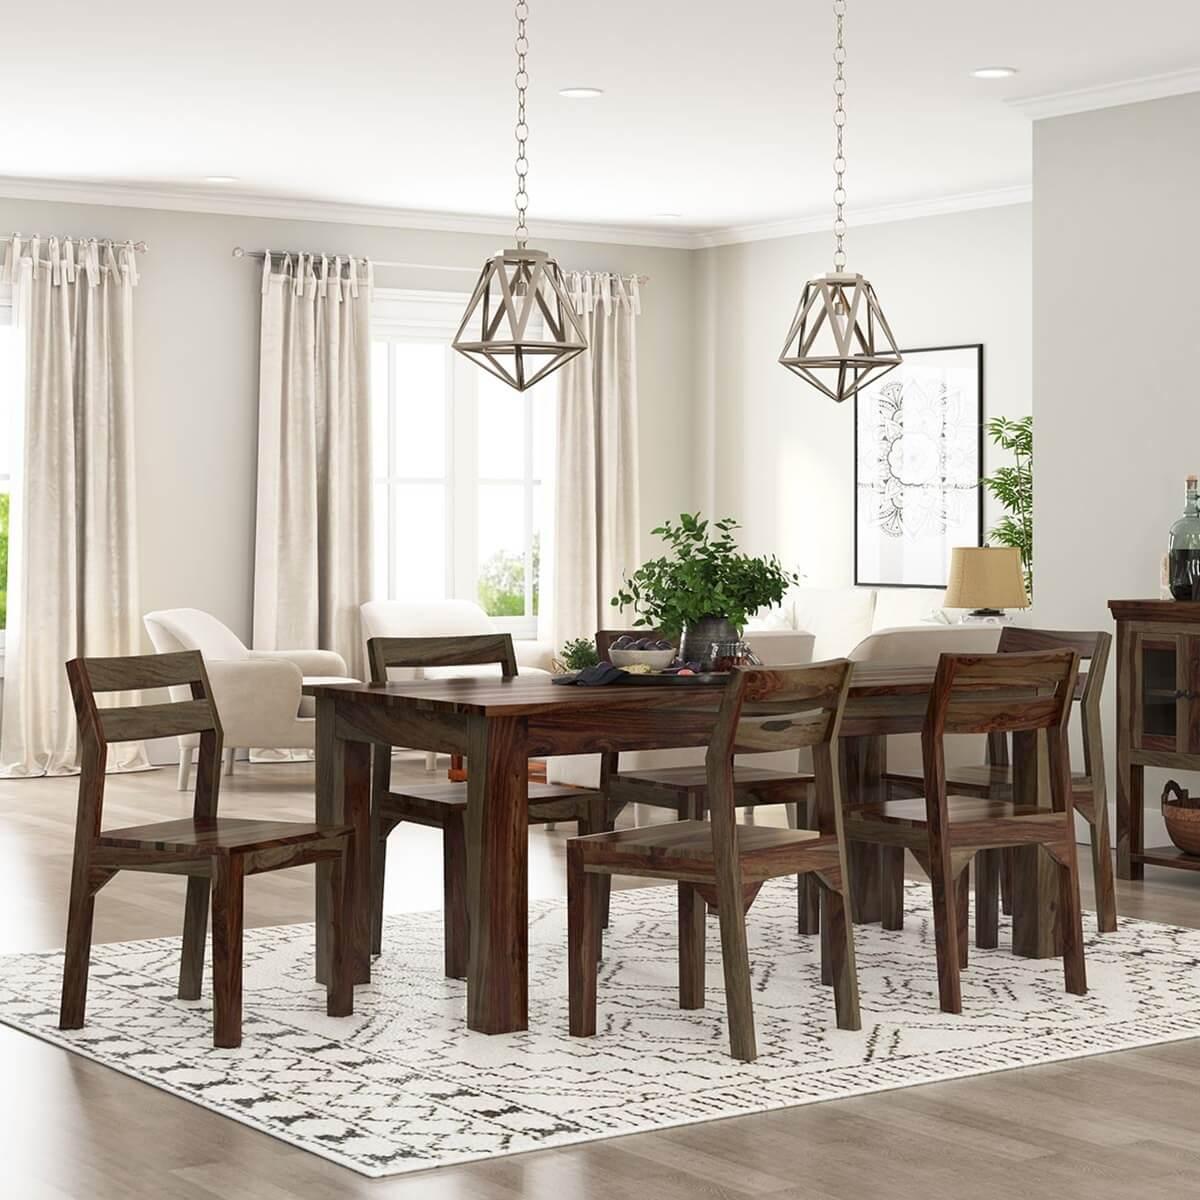 Modern Rustic Sierra Solid Wood 72 Dining Table & Chair Set